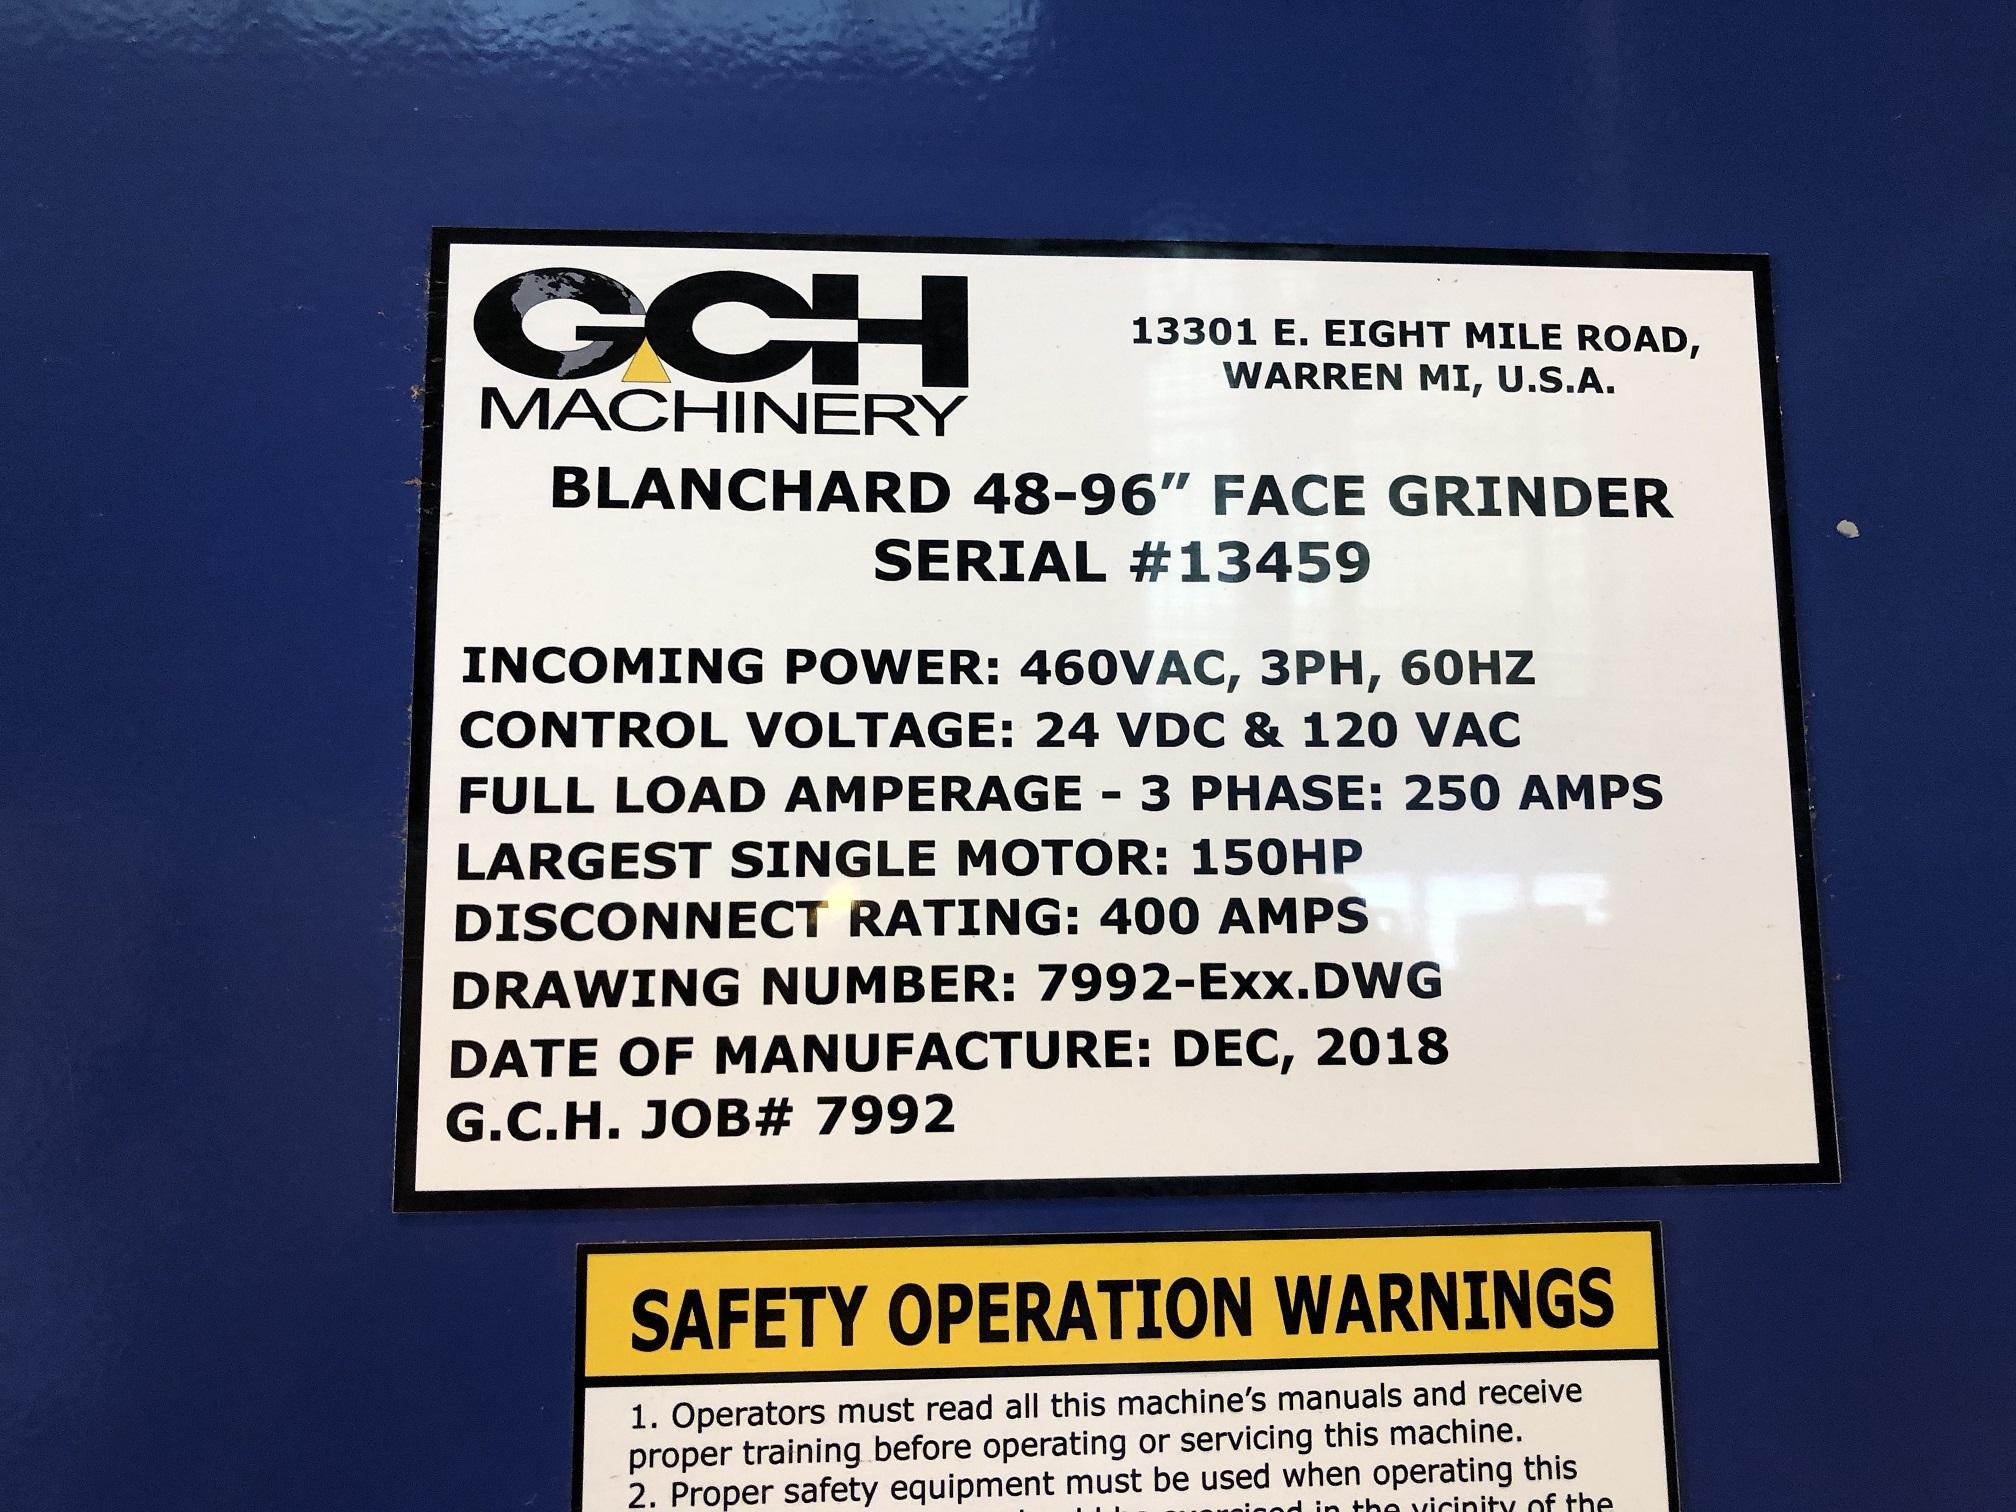 "96"" BLANCHARD, 54"" WHEEL, RECONDITIONED 2018, 150 HP, UNDER POWER"